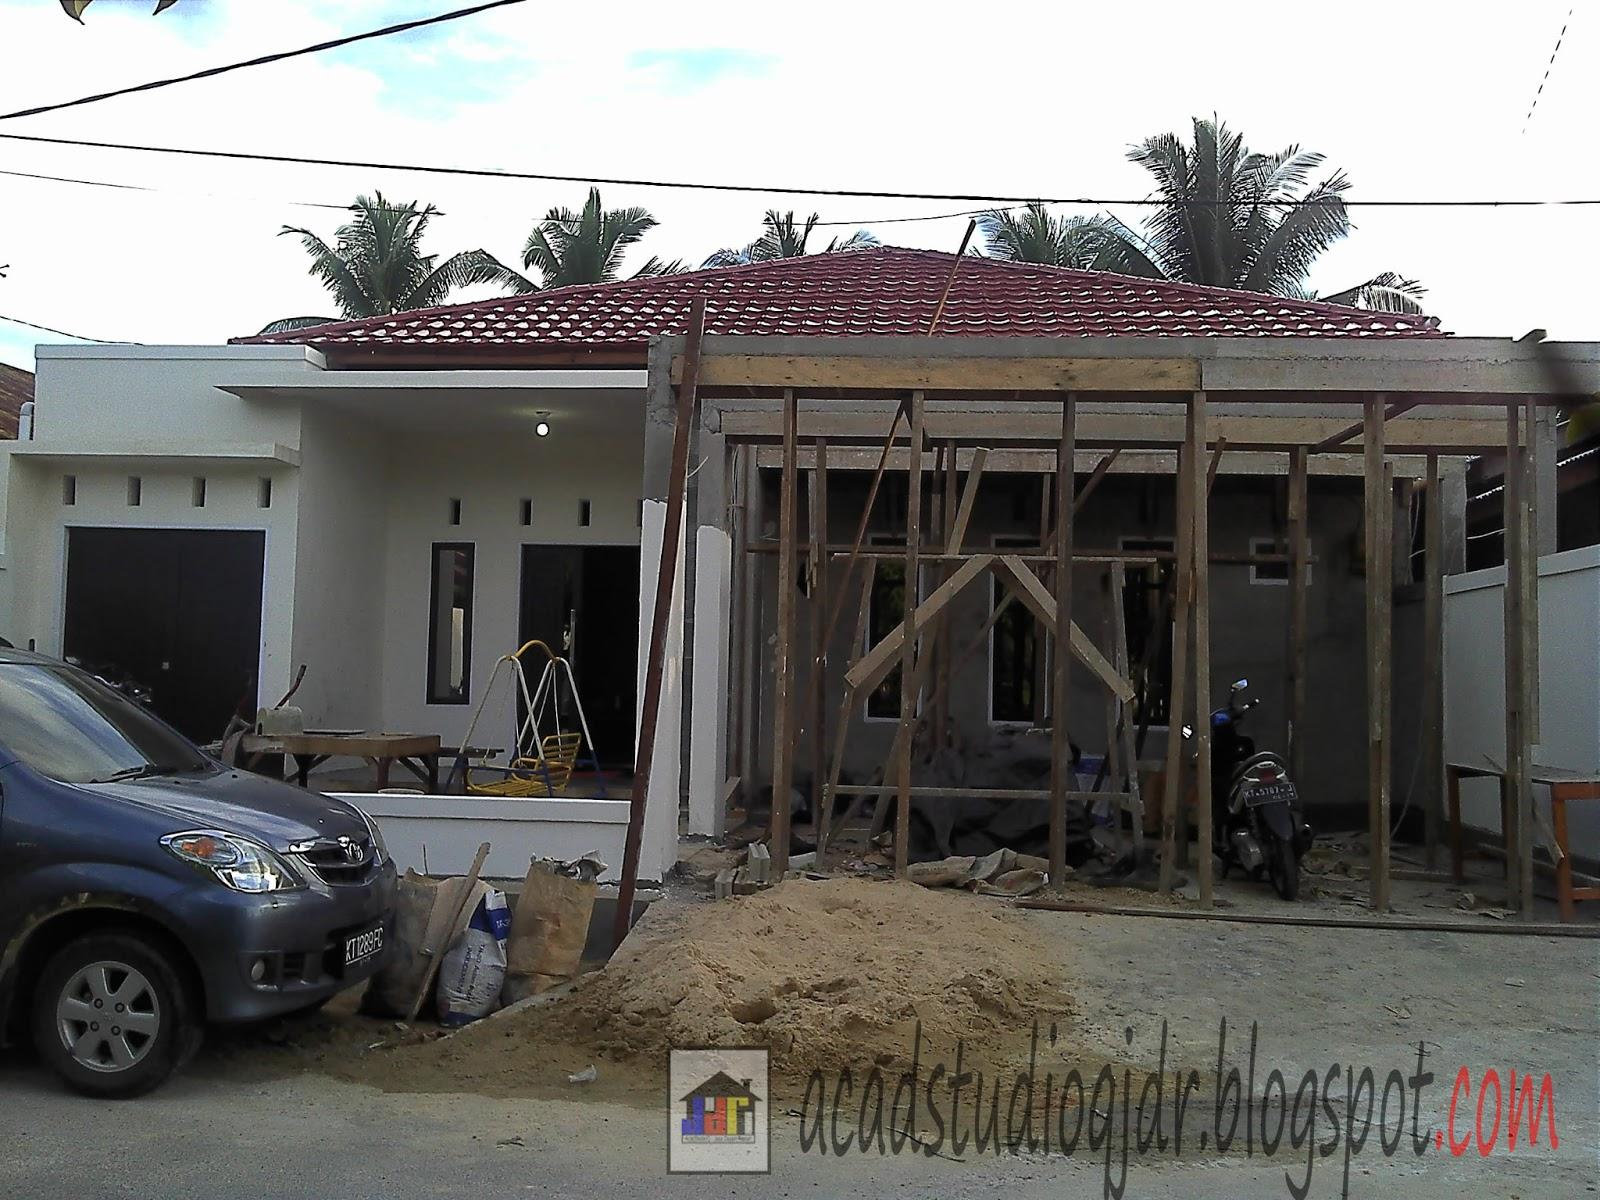 Jasa Desain Rumah - Renovasi Rumah Bpk. Muhammad Ramli